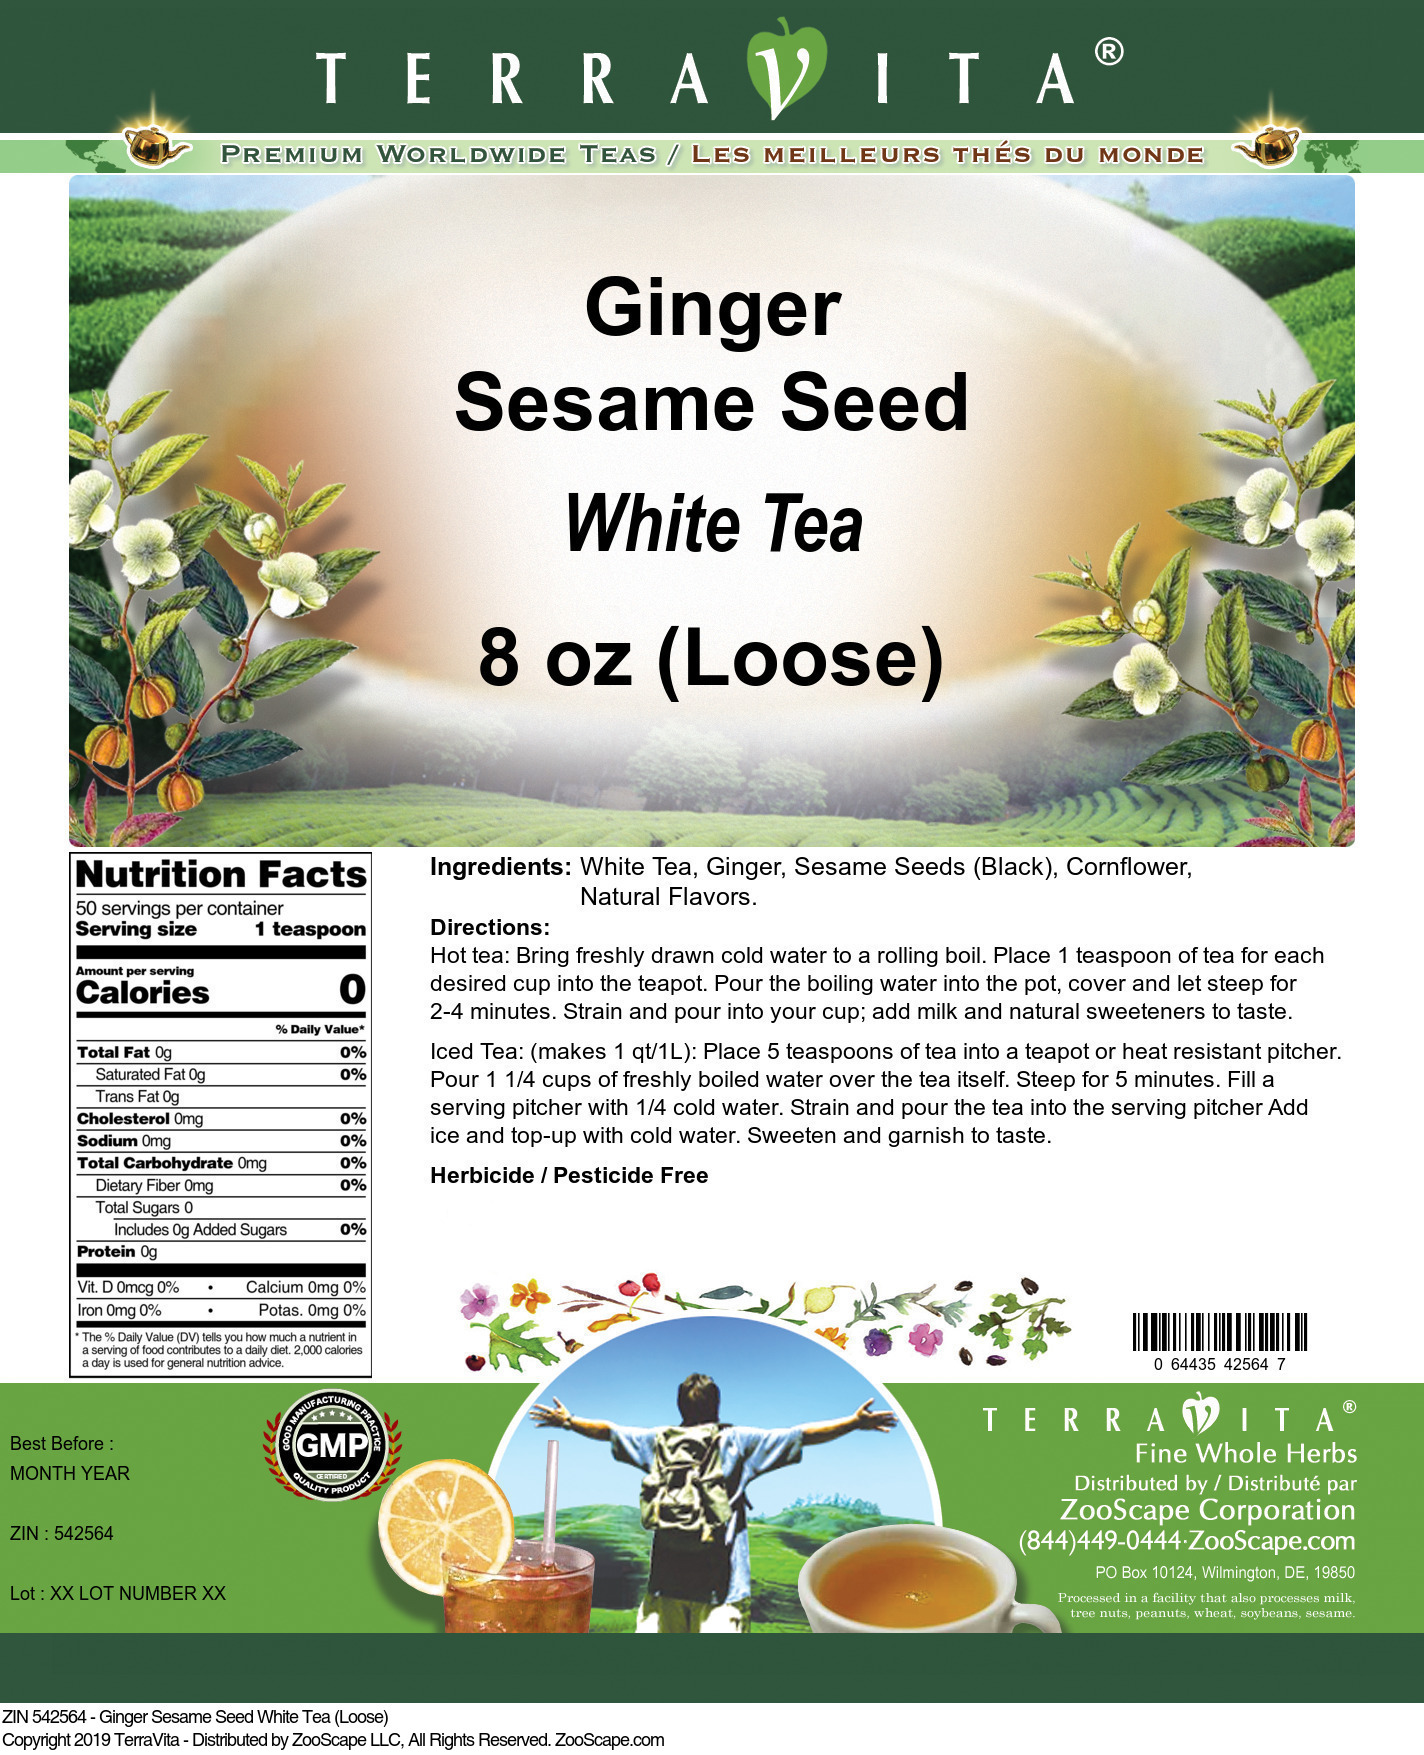 Ginger Sesame Seed White Tea (Loose)